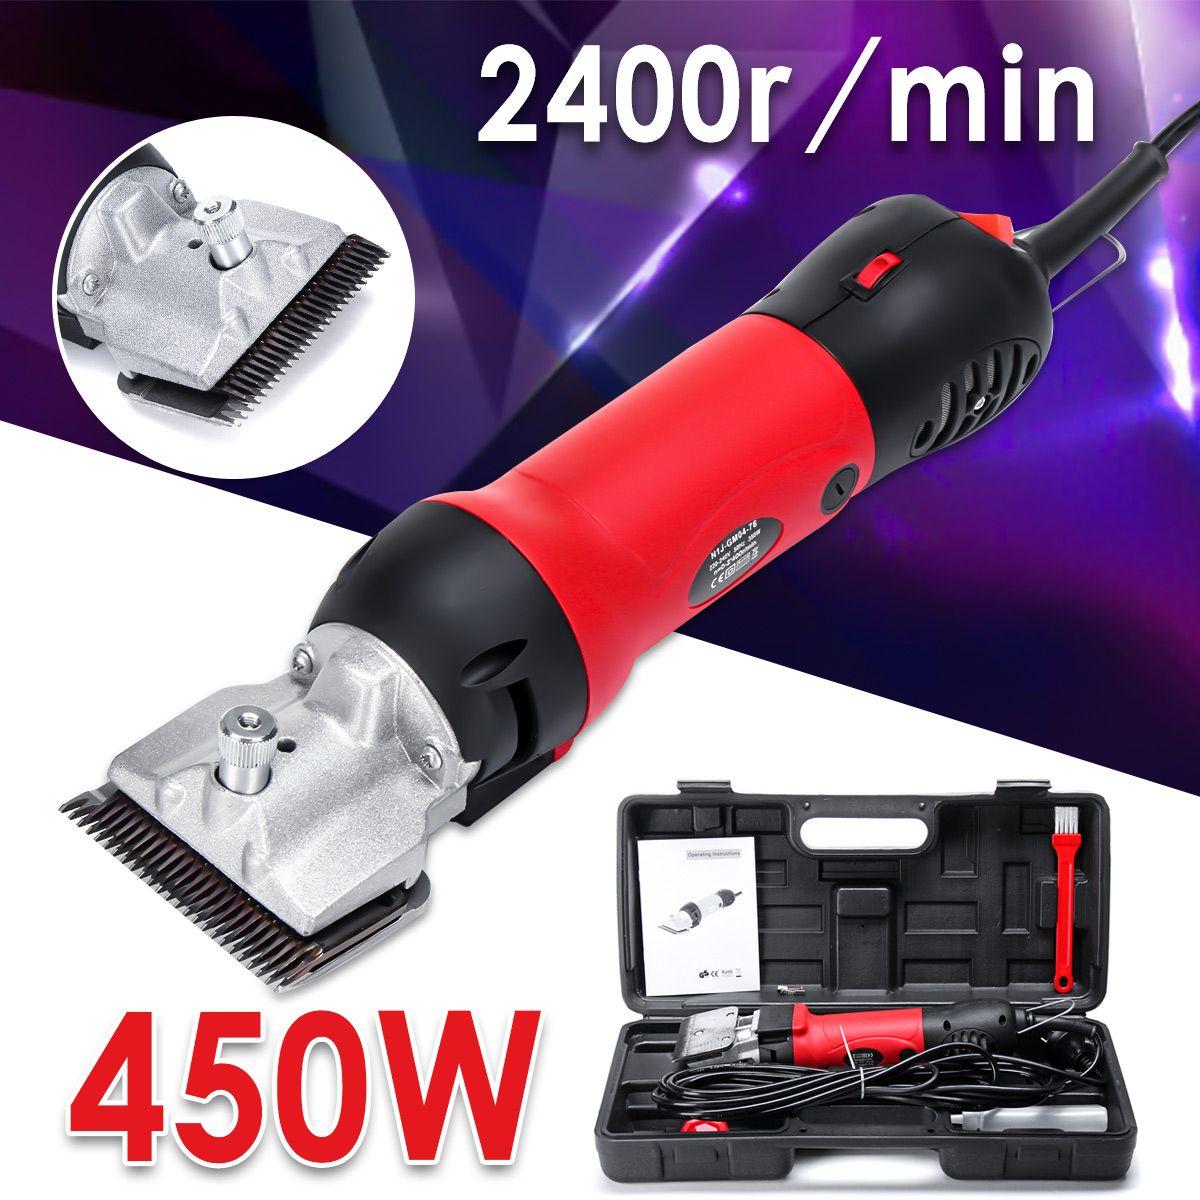 110-240V 450W 2400r/min Professional Electric Animal Horse Camel Dog Shear Clipper Pet Hair Trimmer Hair Shaver Shearing Machine